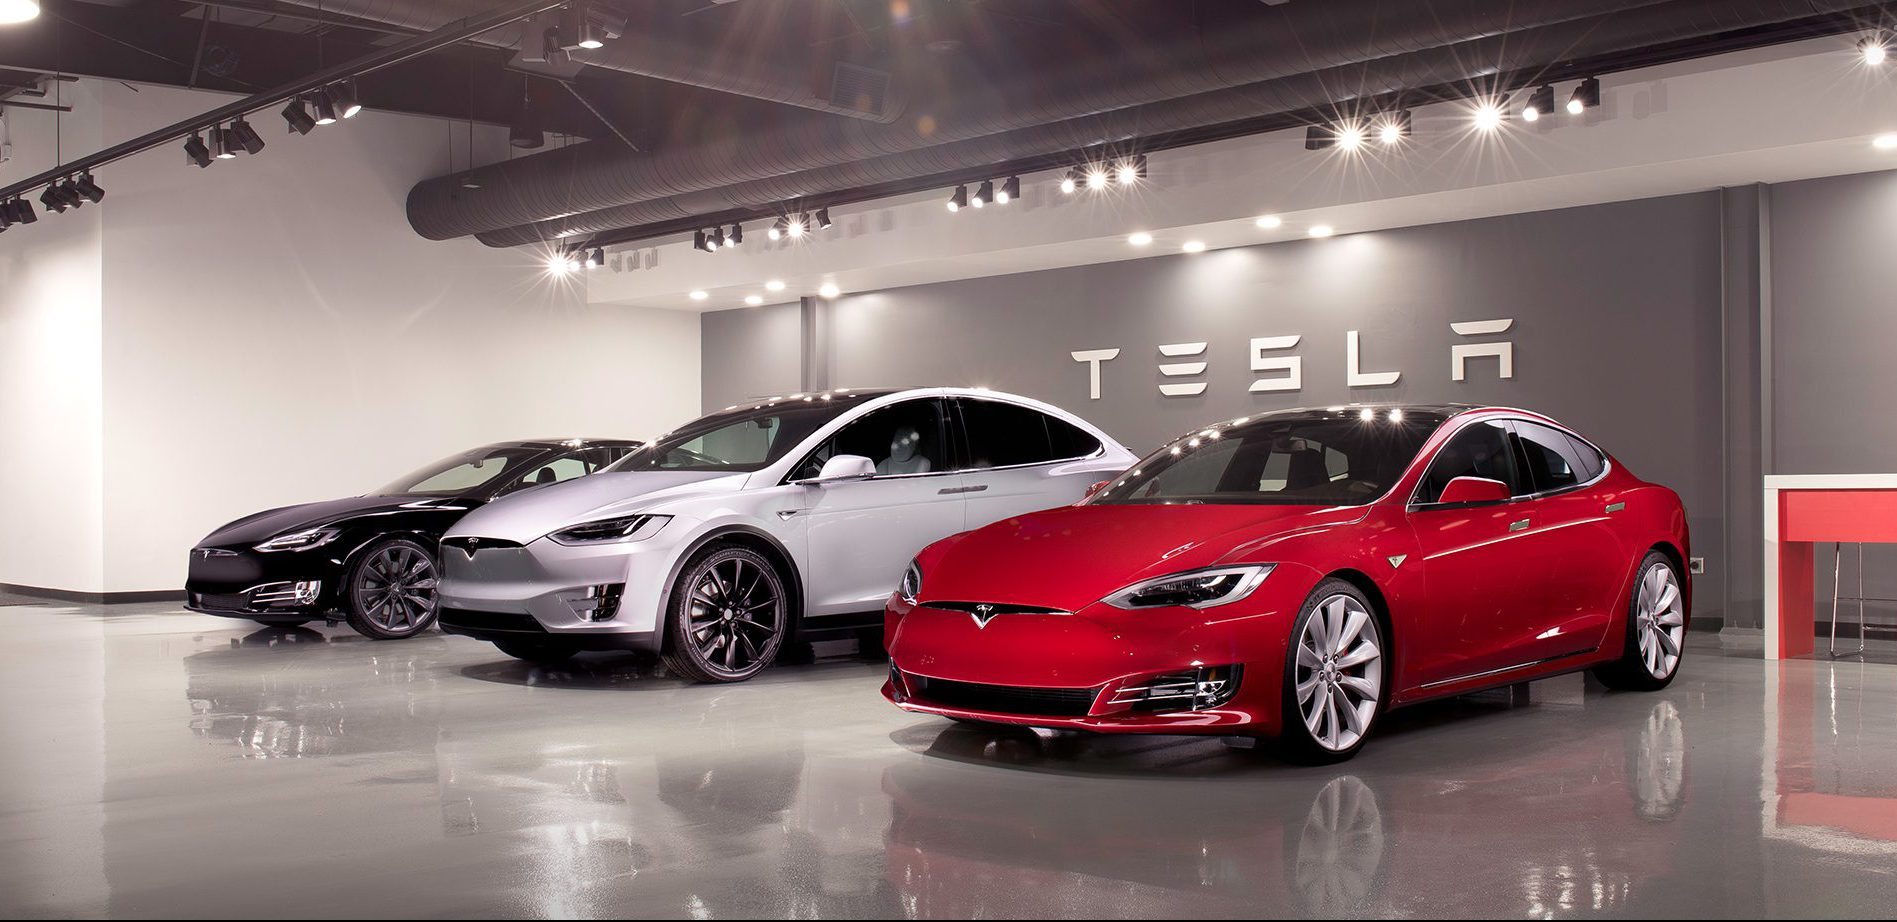 Tesla Inc Stock TSLA news historical stock charts analyst ratings financials and todays Tesla Inc stock price